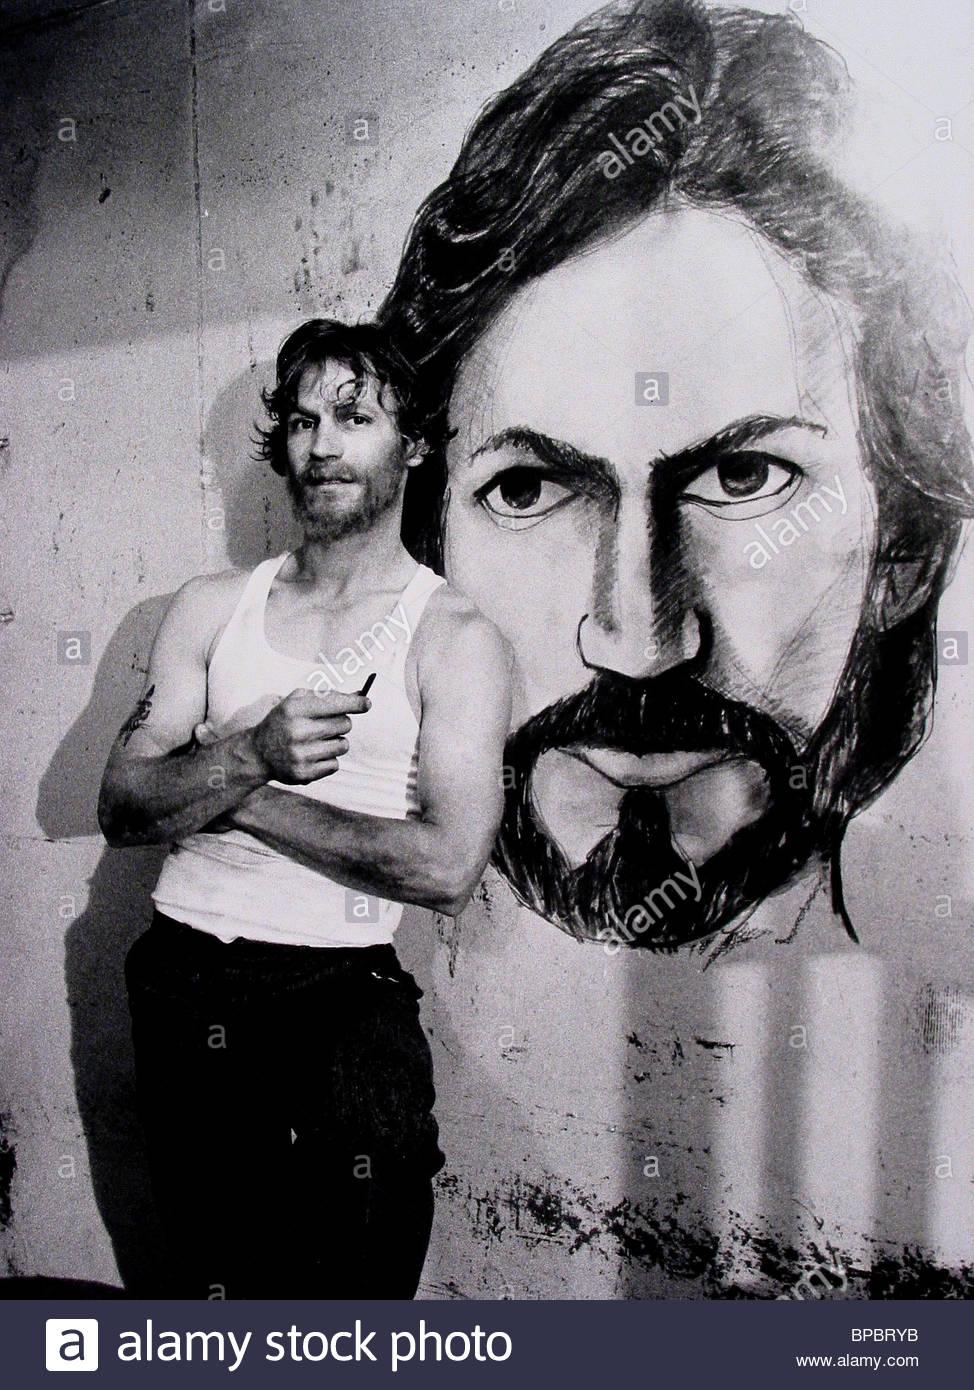 michael-beck-celebrity-1984-BPBRYB.jpg